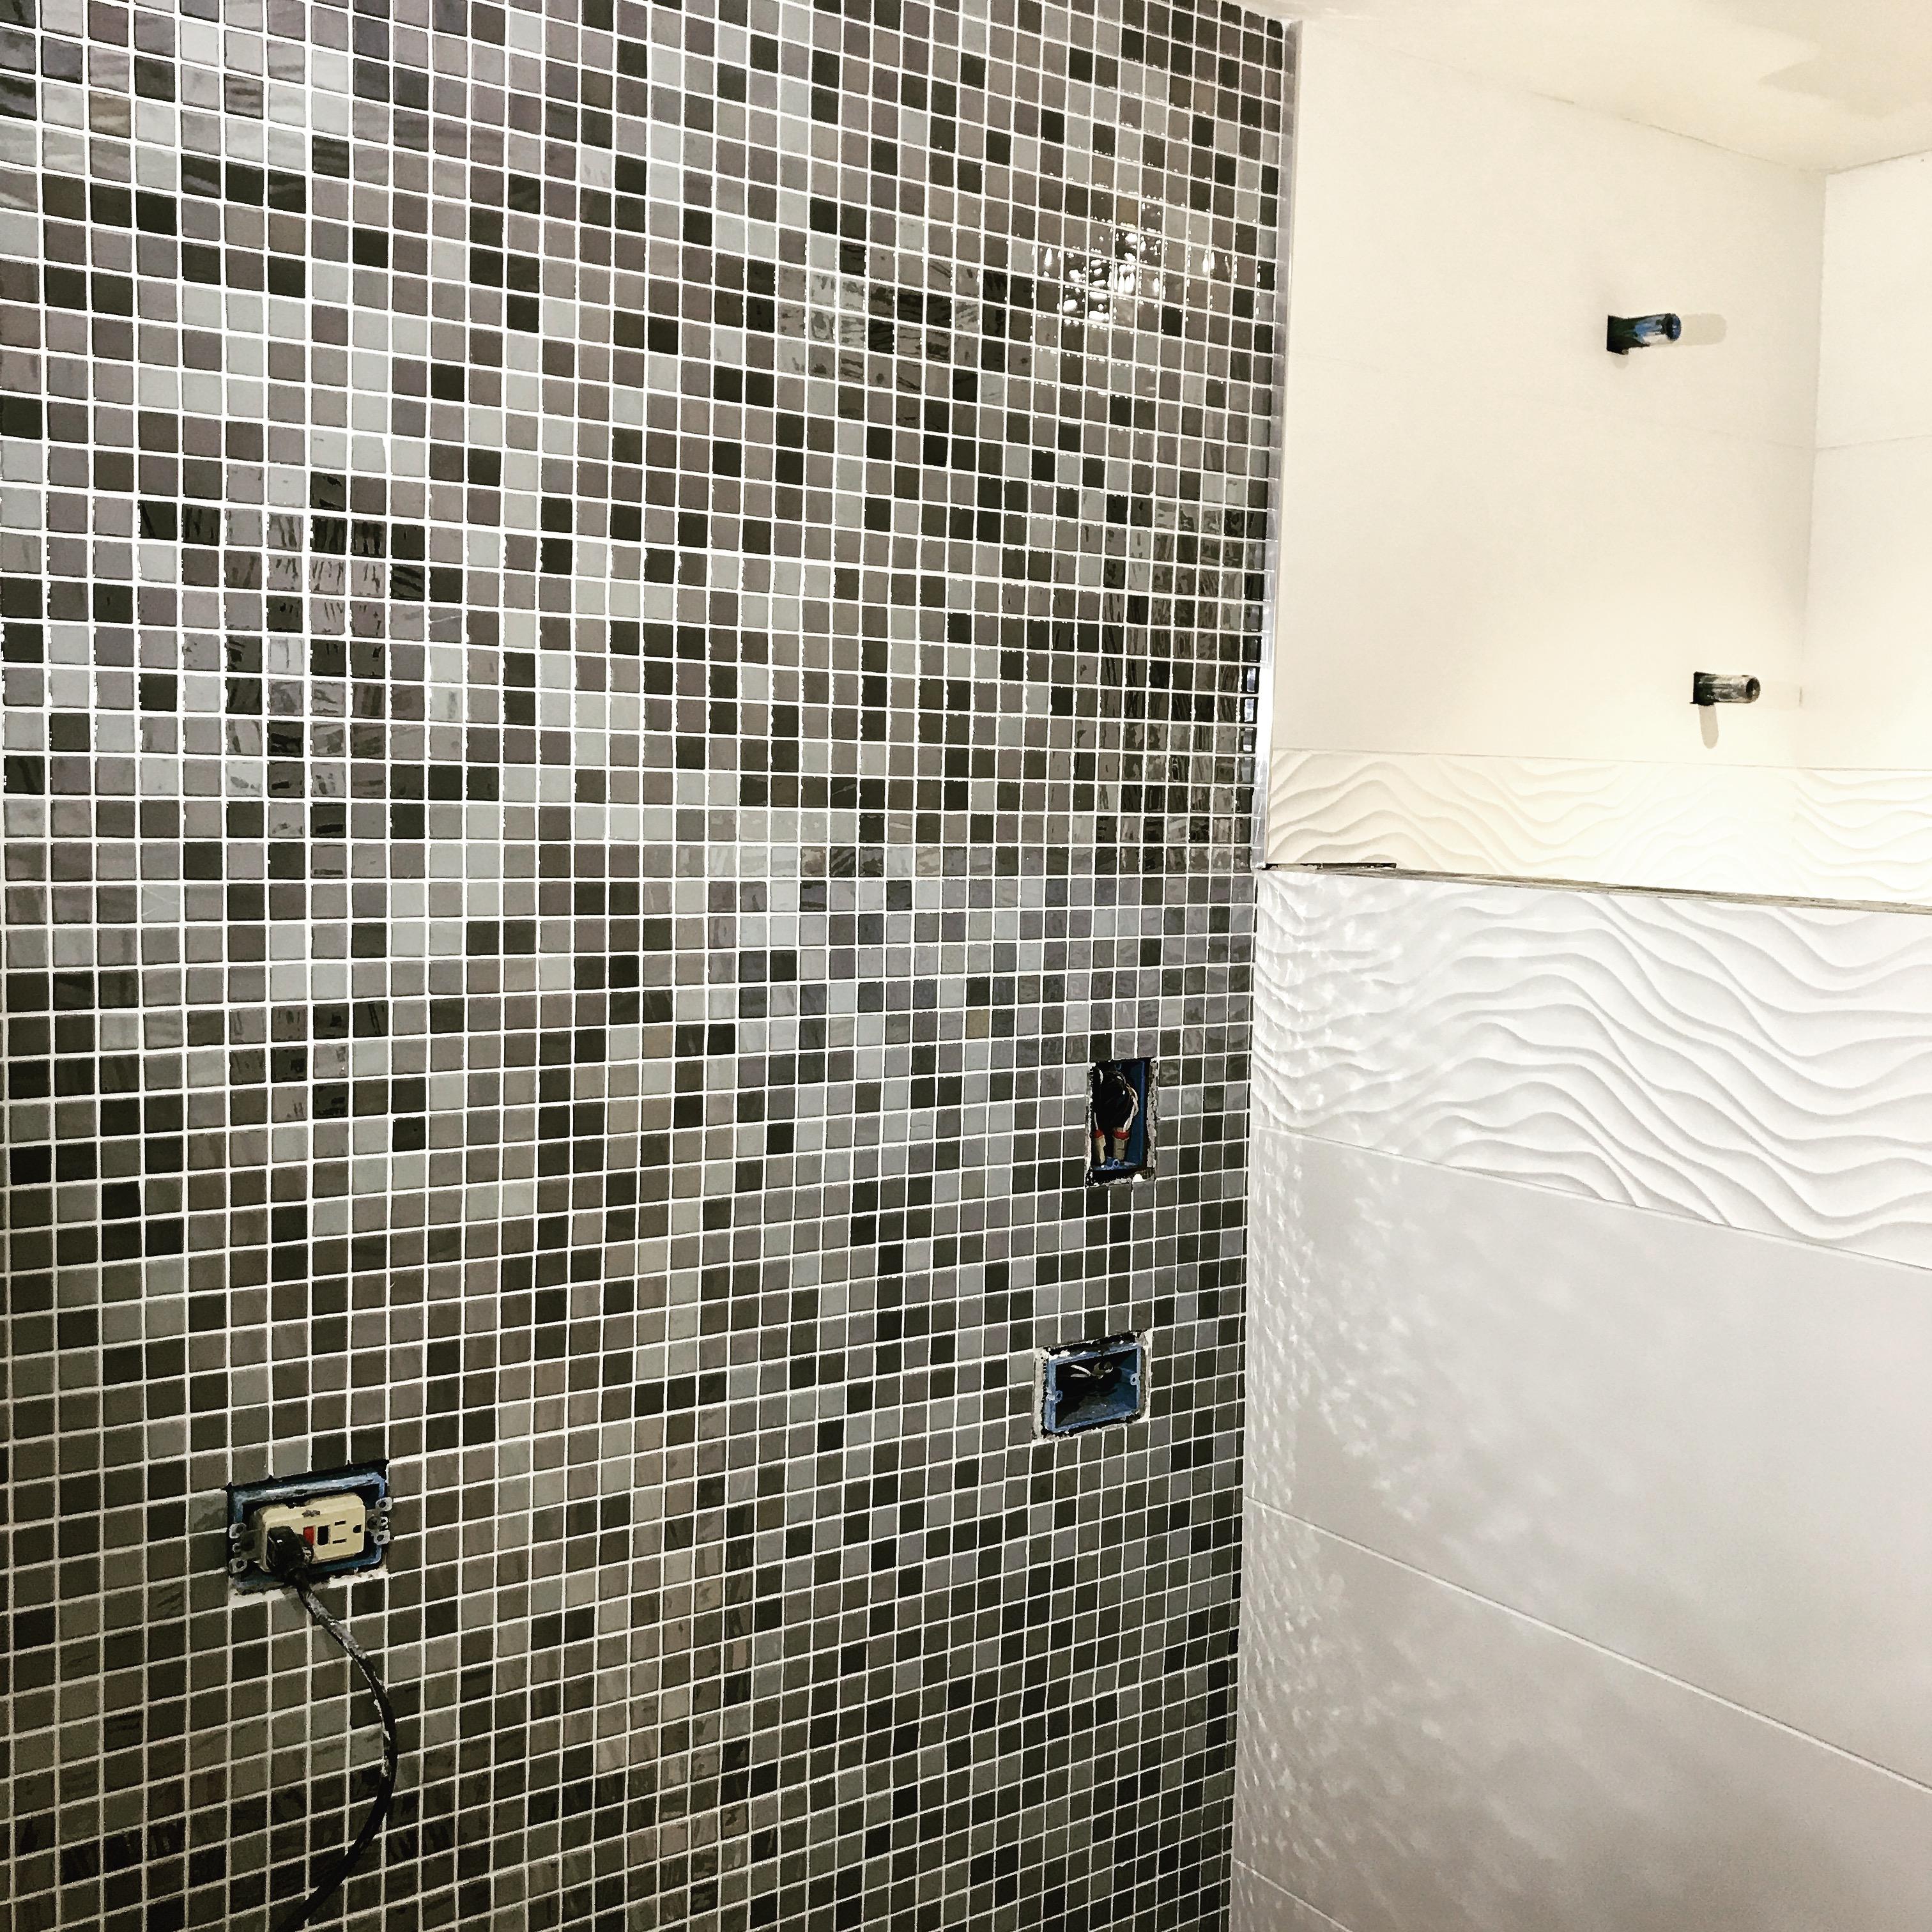 Help me out. Complete bathroom tiled.-1fc1487a-dd81-4852-94a2-d361d71cd500_1528155465458.jpeg